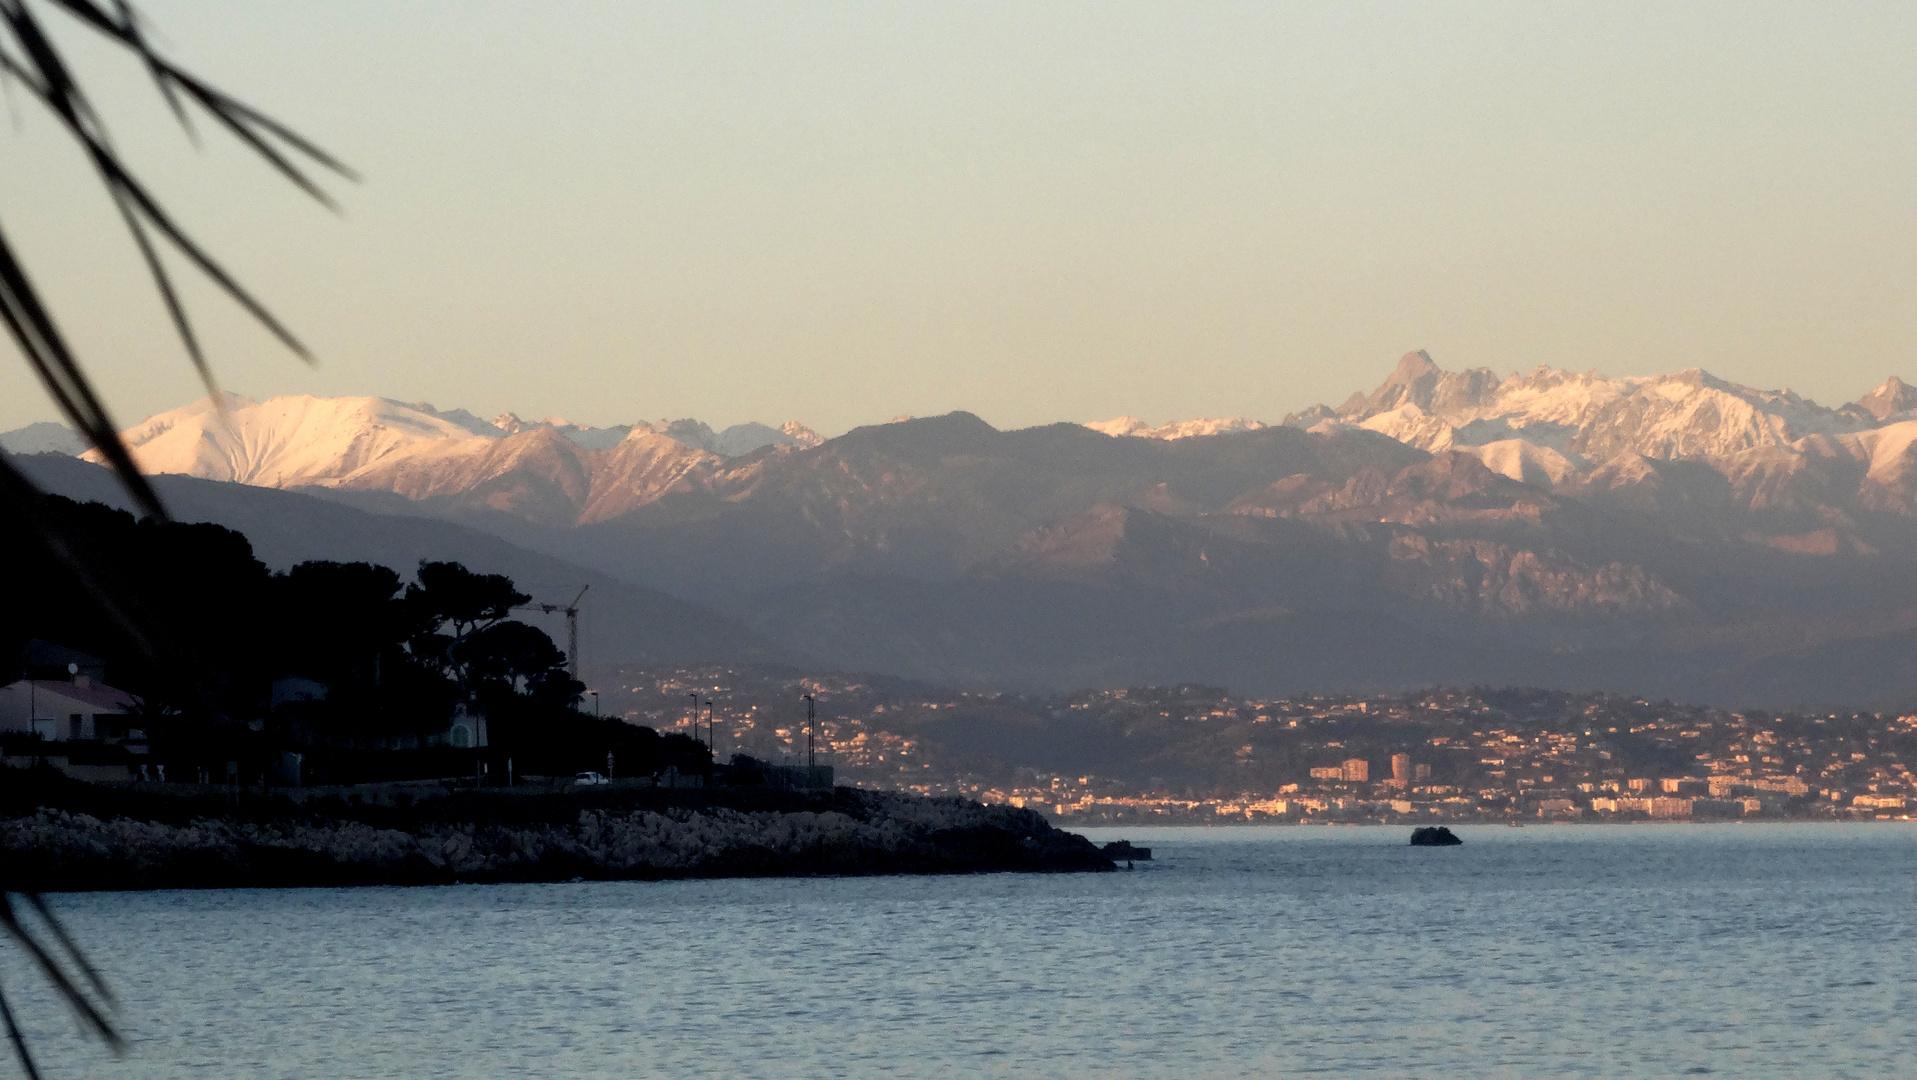 Première neige sur Arrière Pays de Nice - Erster Schnee im Hinterland von Nizza